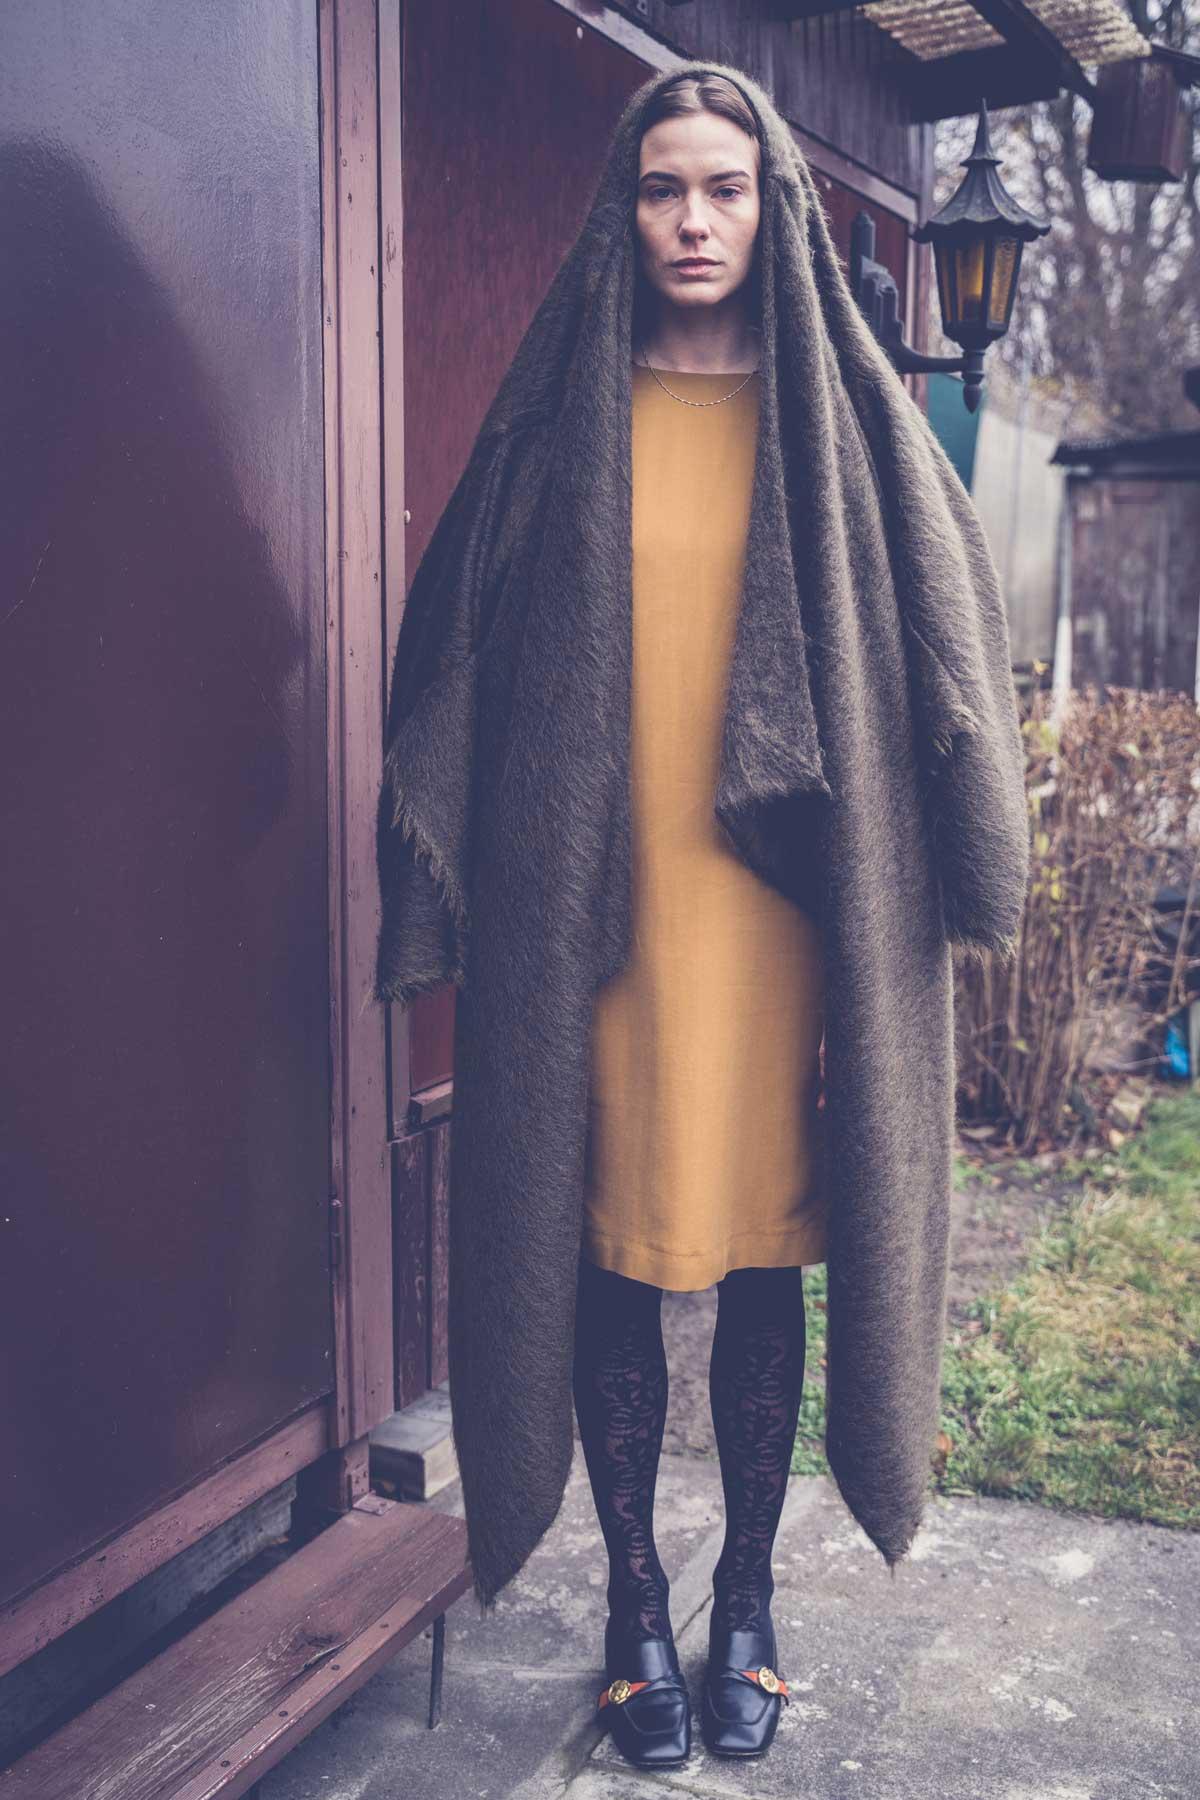 AA GOLD, agency Berlin, alpaca knit, ANNA SCHUSTER, Aqua Rock, art atelier, aw 21, Belvis Soler, berlin labels, berlin techno club label, berlin winter 2020, community resilience, covid19, editorial, editorial outdoor, falke, fashion editorial, fashion fair, fashion photoshoot, frisur, givn, GOOD JEWELRY, gots certification, hand sewn garments, handmade garments, HENRI+FRANK, Hessnatur, independent magazine, independent production, lanius, LEIT & HELD, Luxiders agency, luxiders magazine, make monday sunday, merino wool, messe frankfurt, moda sostenible, nakt, neonyt, OFTT, organic fashion process, organic textiles, pb0110, photography, photoshoot, silk relations berlin, sustainable brands, sustainable fashion, sustainable fashion berlin, sustainable fashion week 2021, sustainable magazine, sustainable platform, sustainable polish brand, sustainable week, Taylor and thomas, tencel fabric, The Good Store, visual essay, winter photoshoot